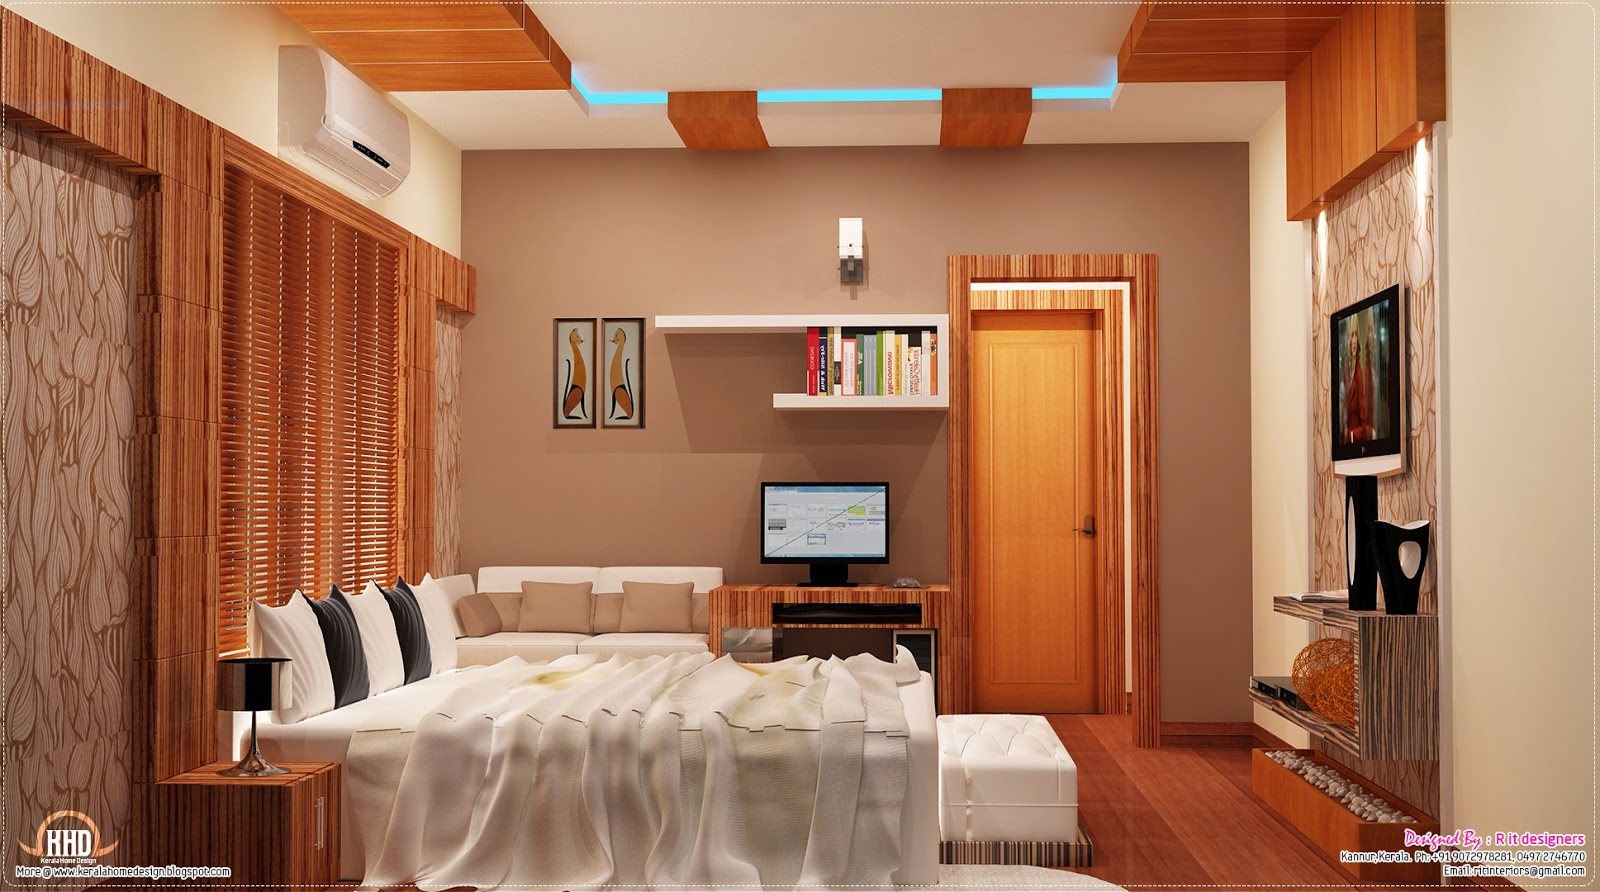 2700 sq.feet Kerala home with interior designs - Kerala ...